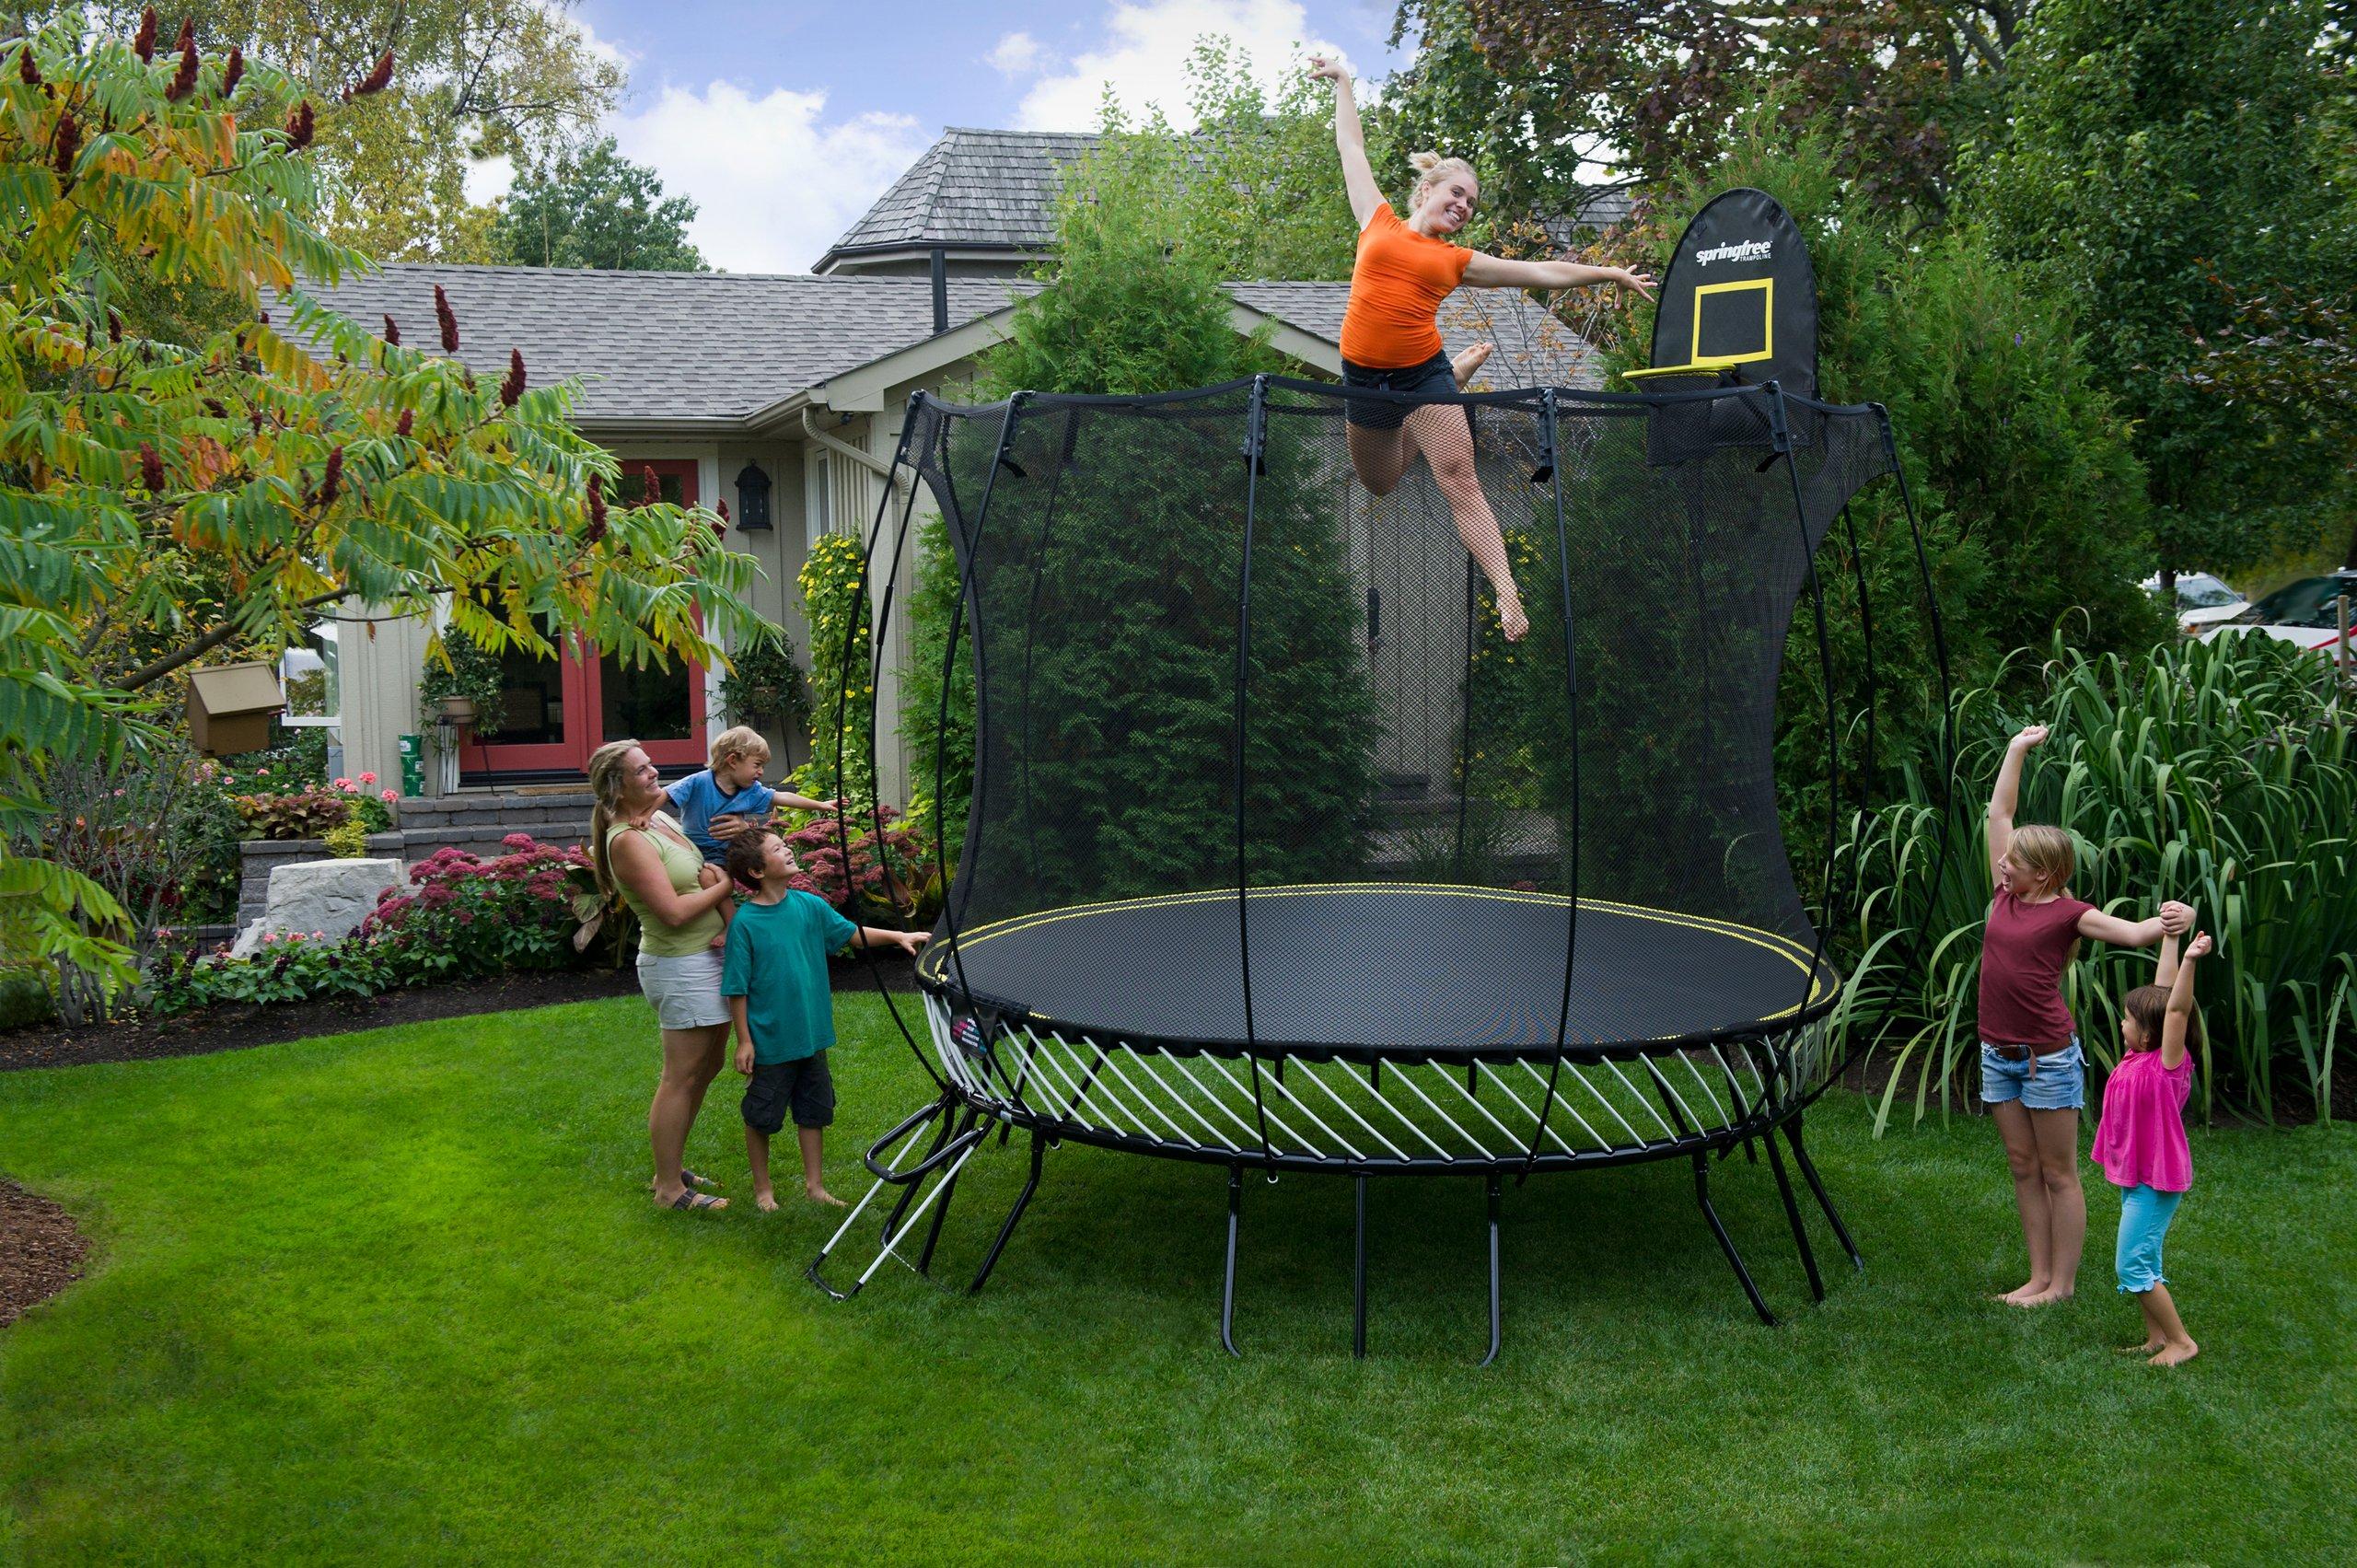 Springless trampoline classy baby gear for Springfree trampoline